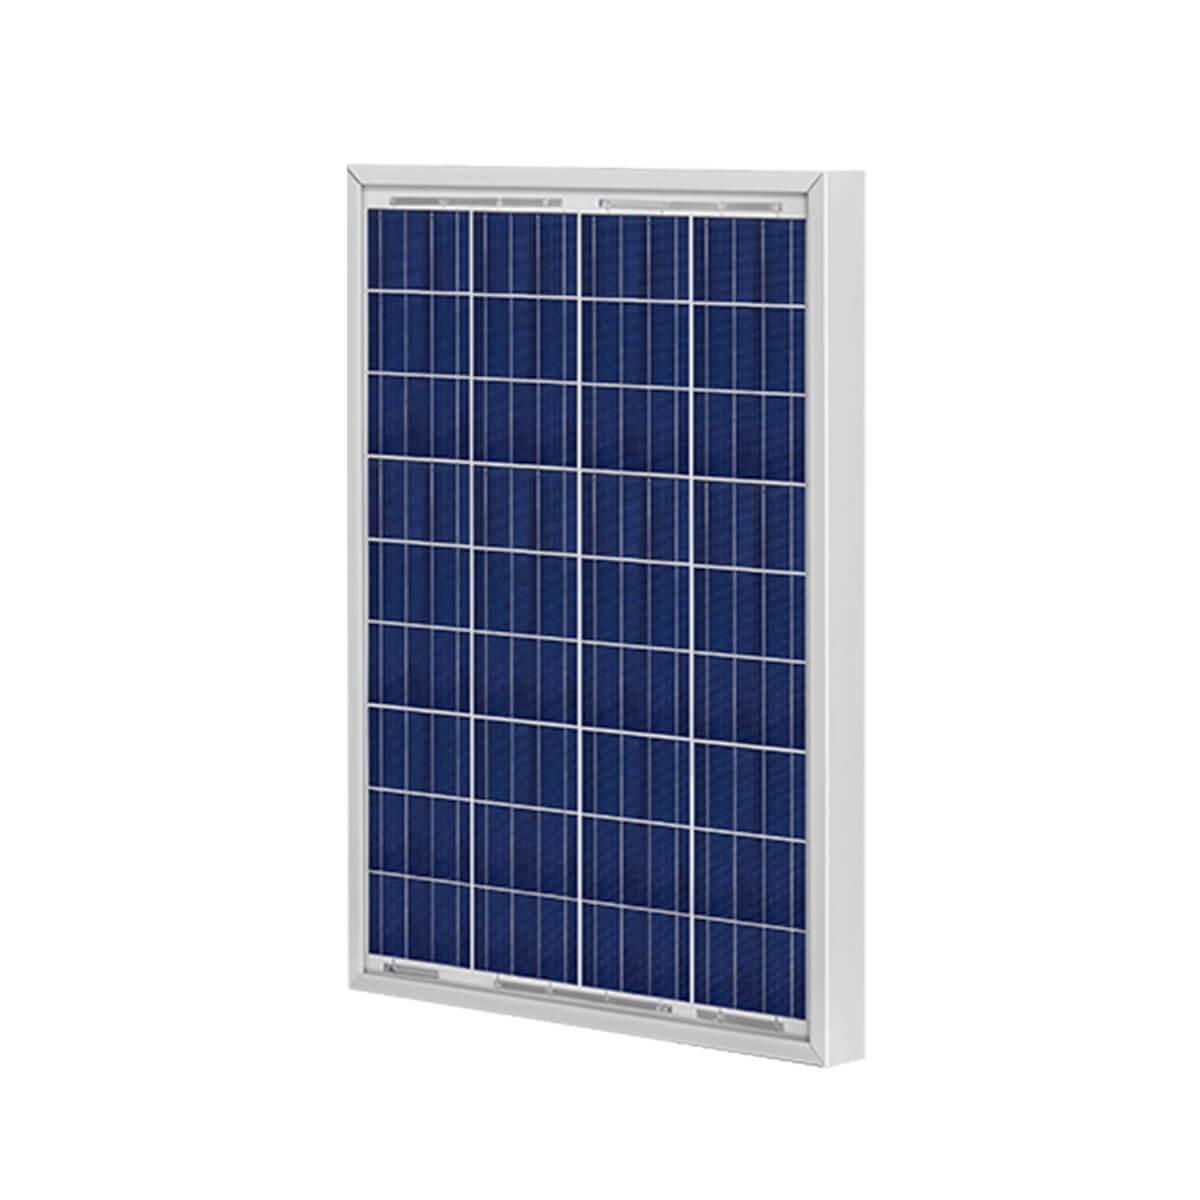 Odul solar 80W panel, odul solar 80Watt panel, Odul solar 80 W panel, odul solar 80 Watt panel, odul solar 80 Watt polikristal panel, Odul solar 80 W watt gunes paneli, odul solar 80 W watt polikristal gunes paneli, odul solar 80 W Watt fotovoltaik polikristal solar panel, odul solar 80W polikristal gunes enerjisi, odul solar OSP-80W panel, ÖDÜL SOLAR 80 WATT